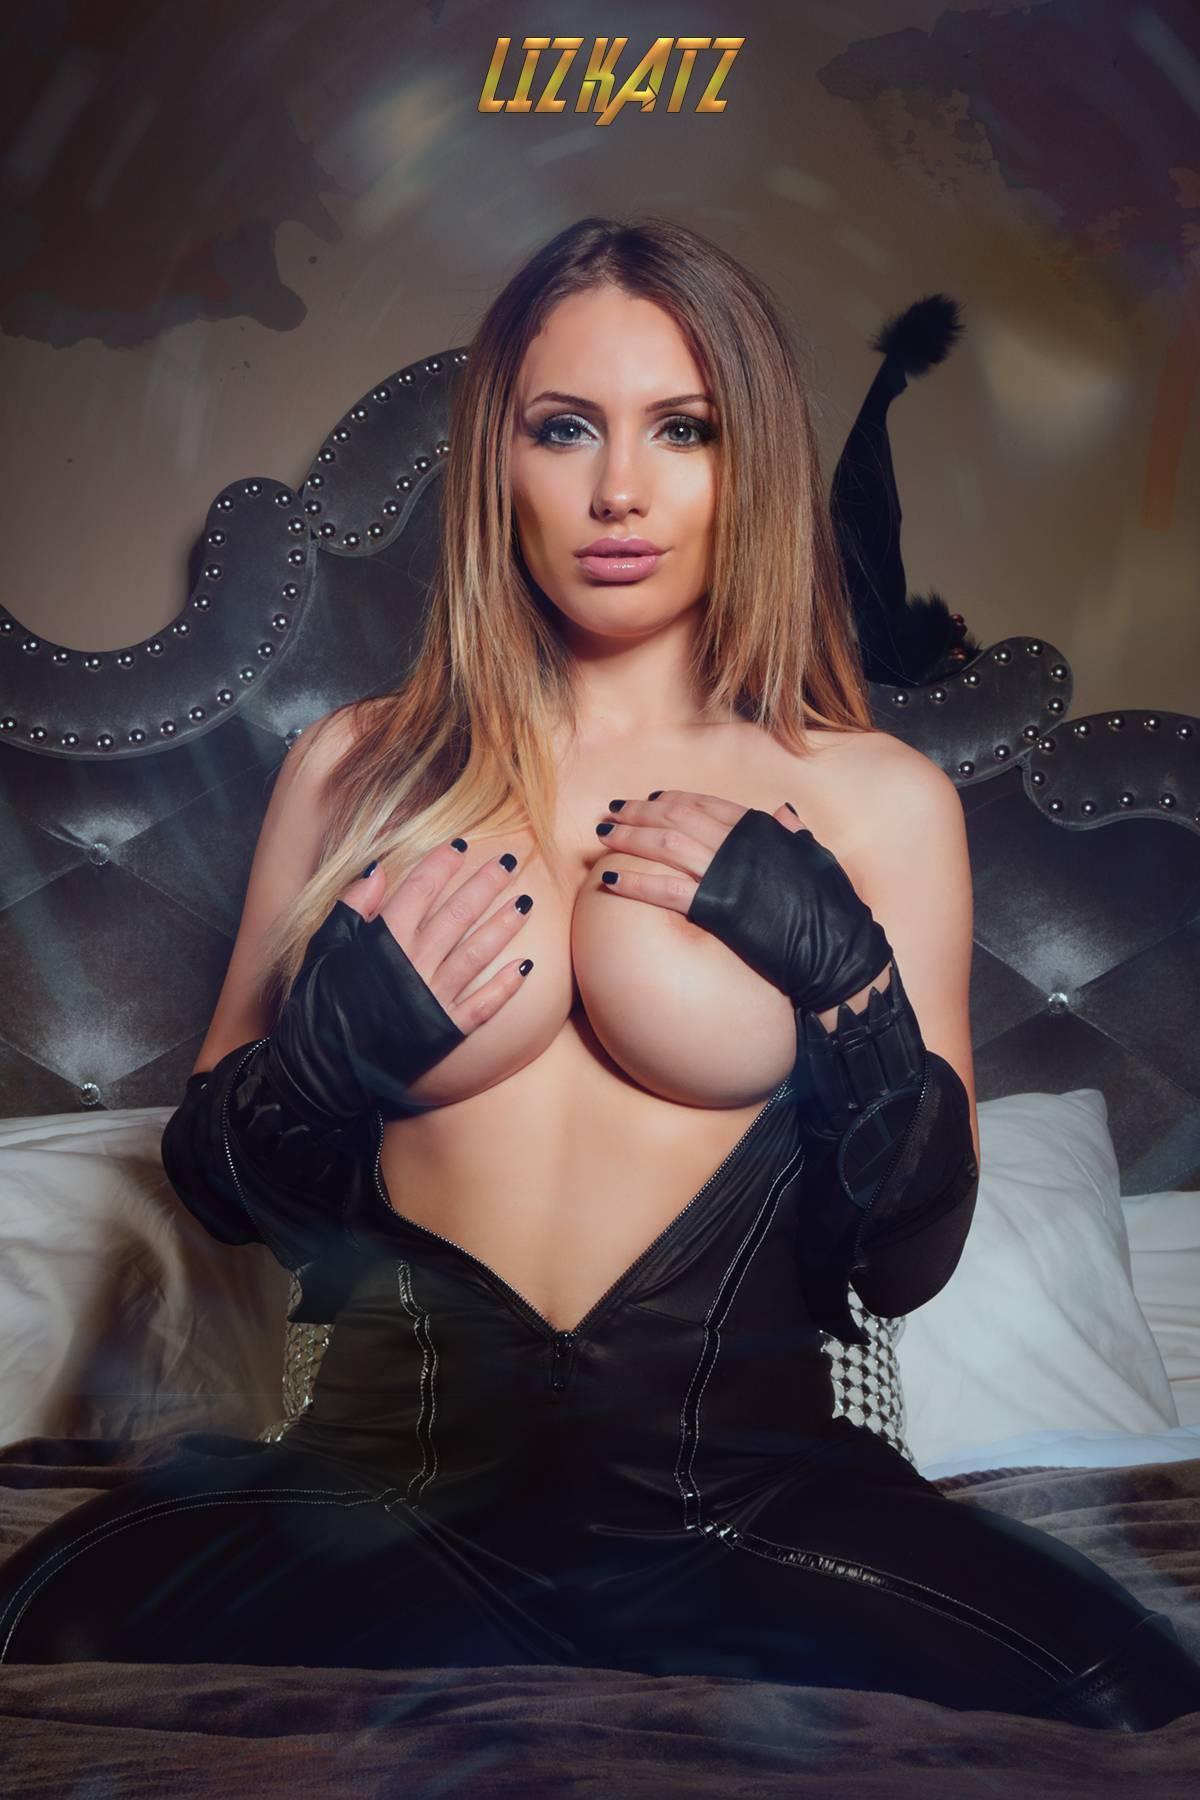 Liz Katz Topless Black Widow Cosplay Onlyfans Set Leaked Uzobuw